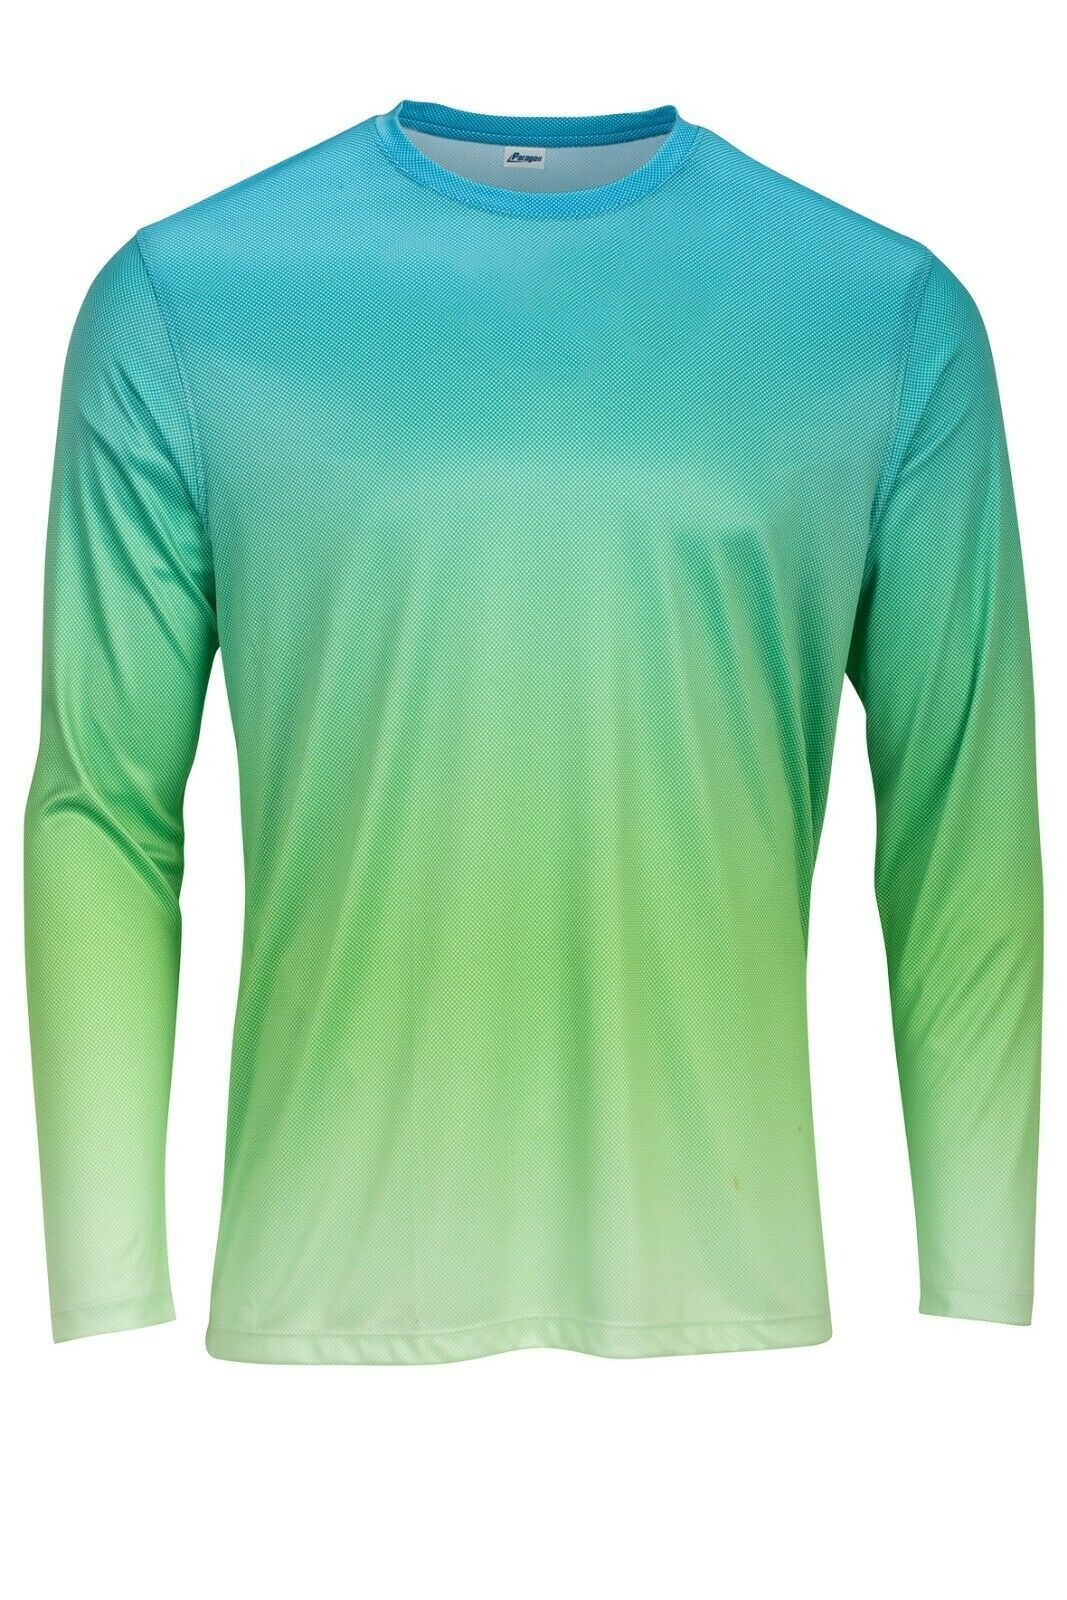 Sun Protection Long Sleeve Dri Fit  Aqua Blue Lime  base layer sun shirt UPF 50+